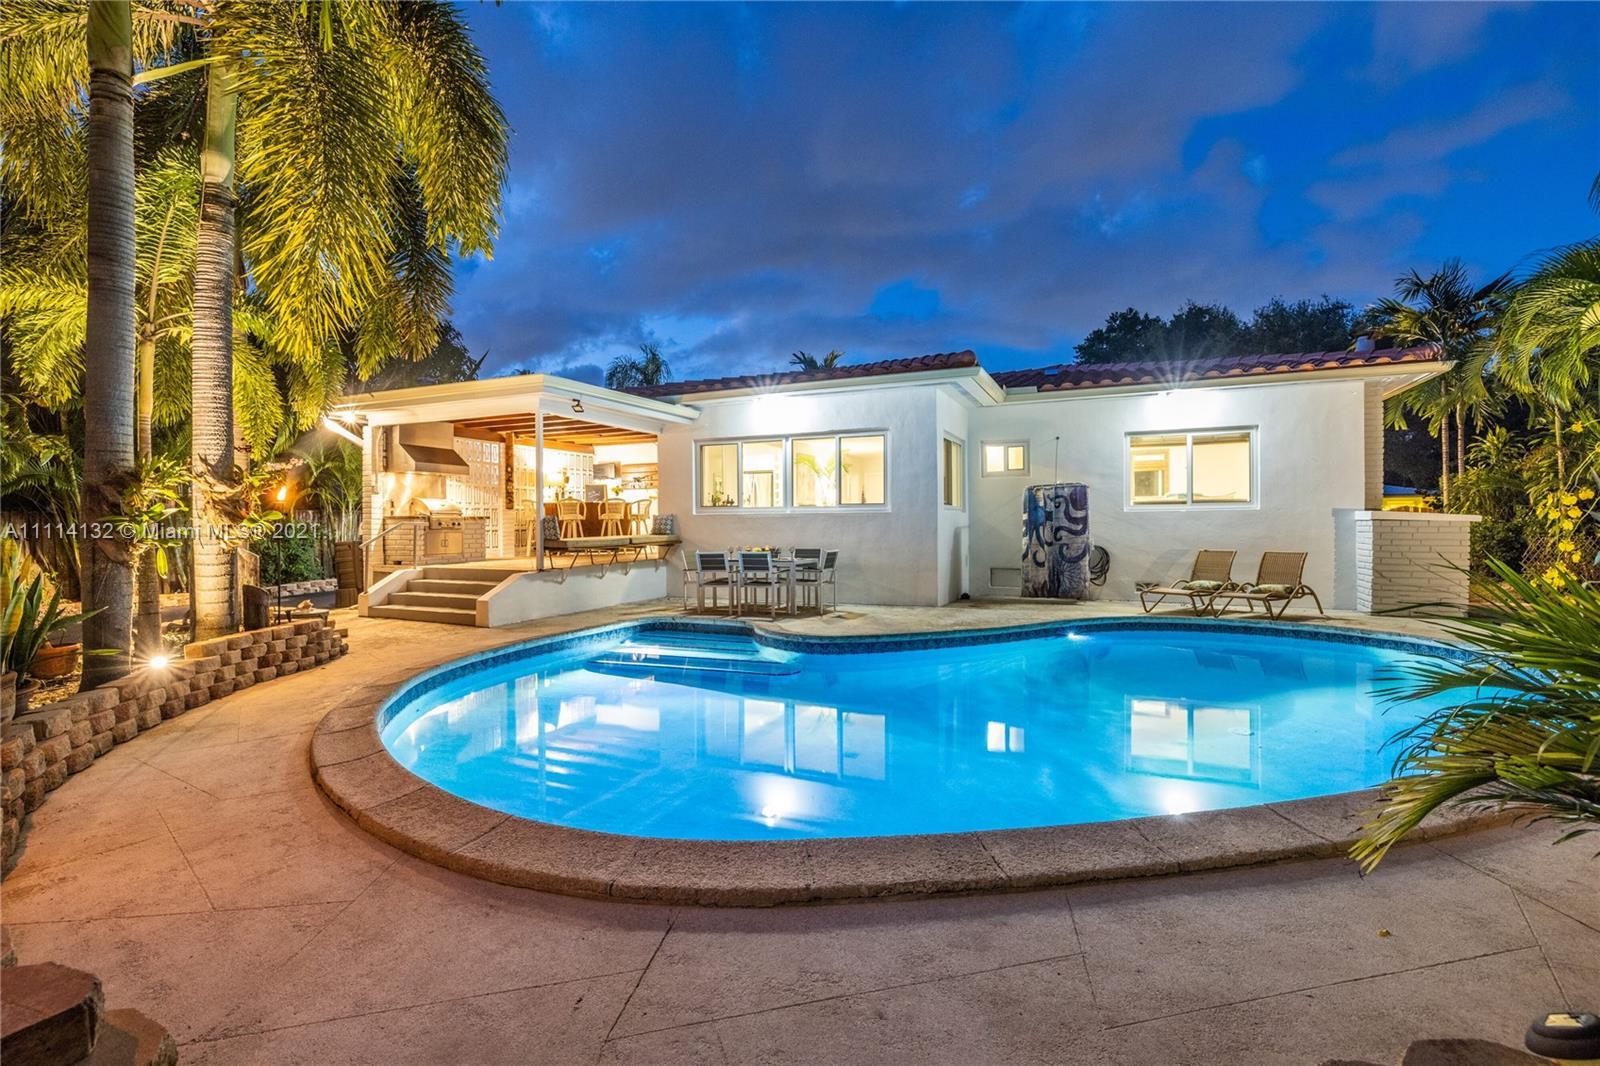 Single Family Home,For Sale,960 NE 92nd St, Miami Shores, Florida 33138,Brickell,realty,broker,condos near me